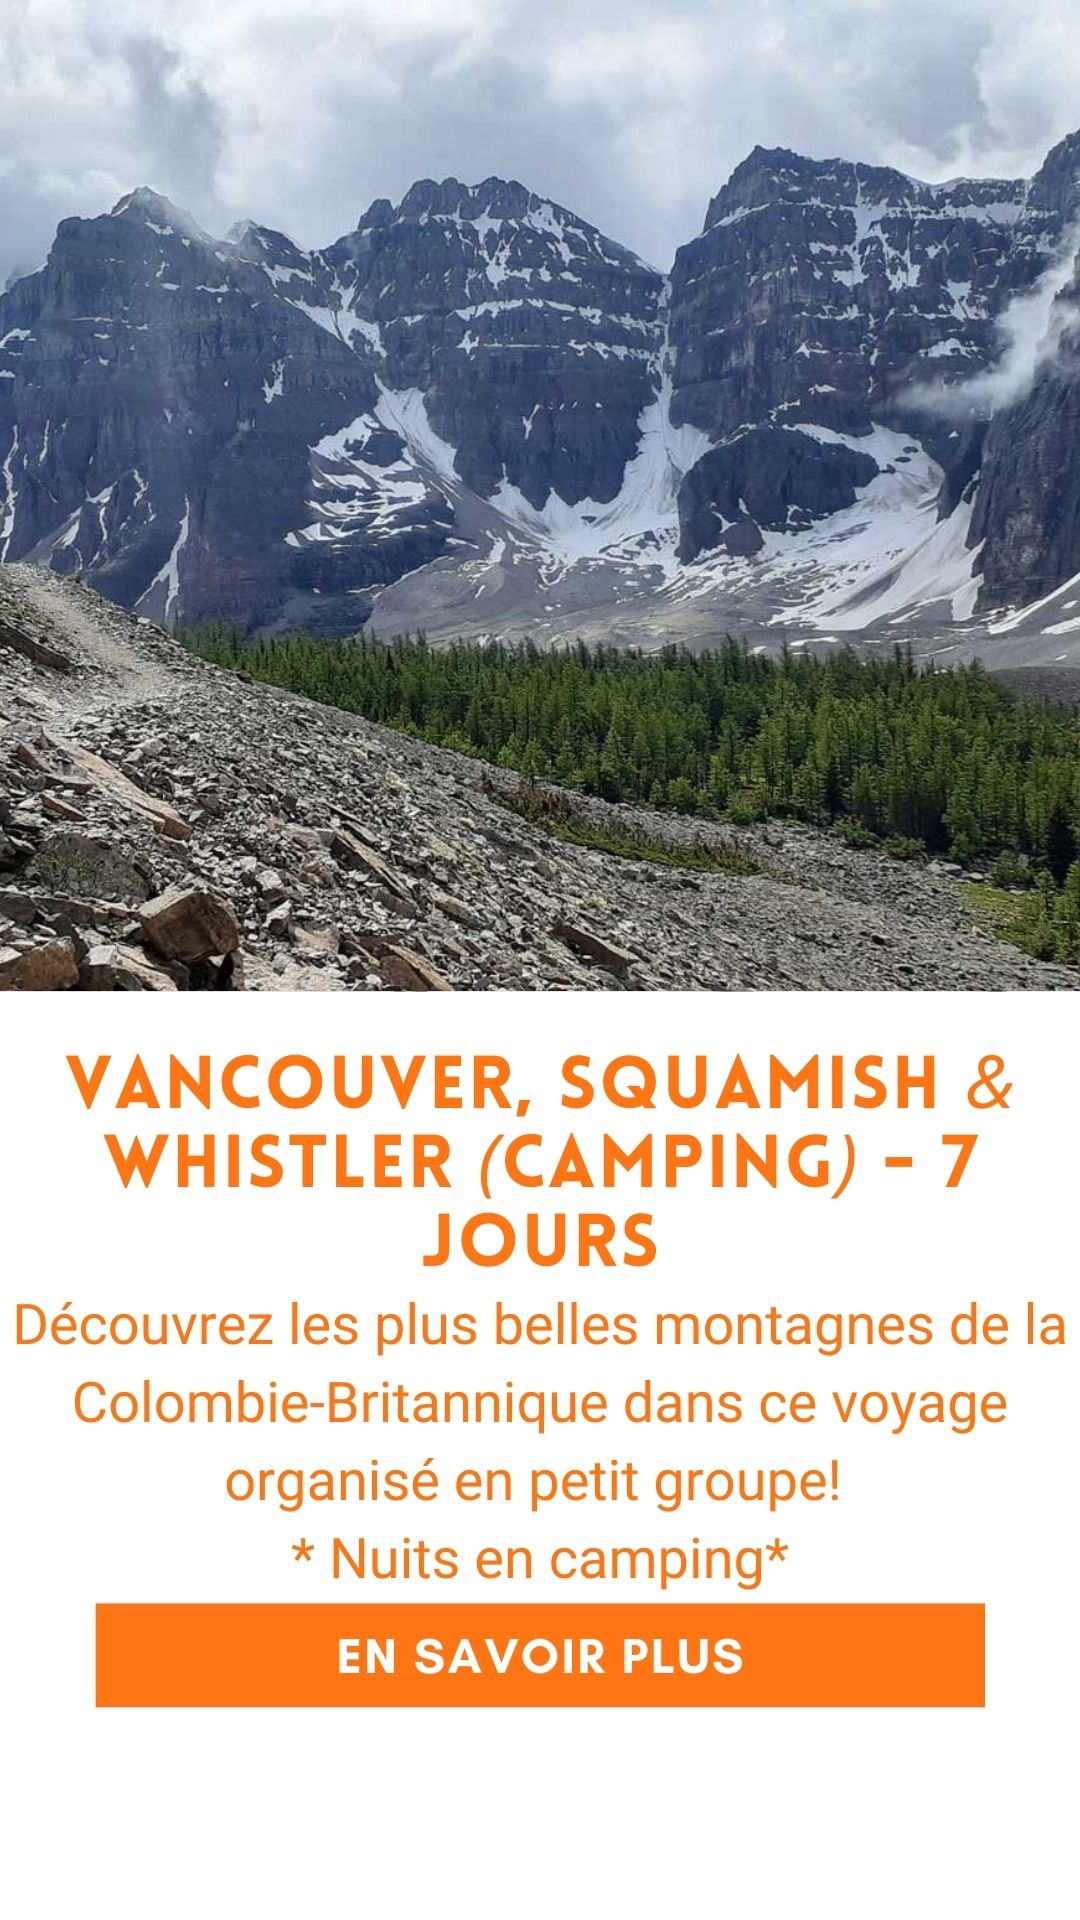 ouest canadien voyage